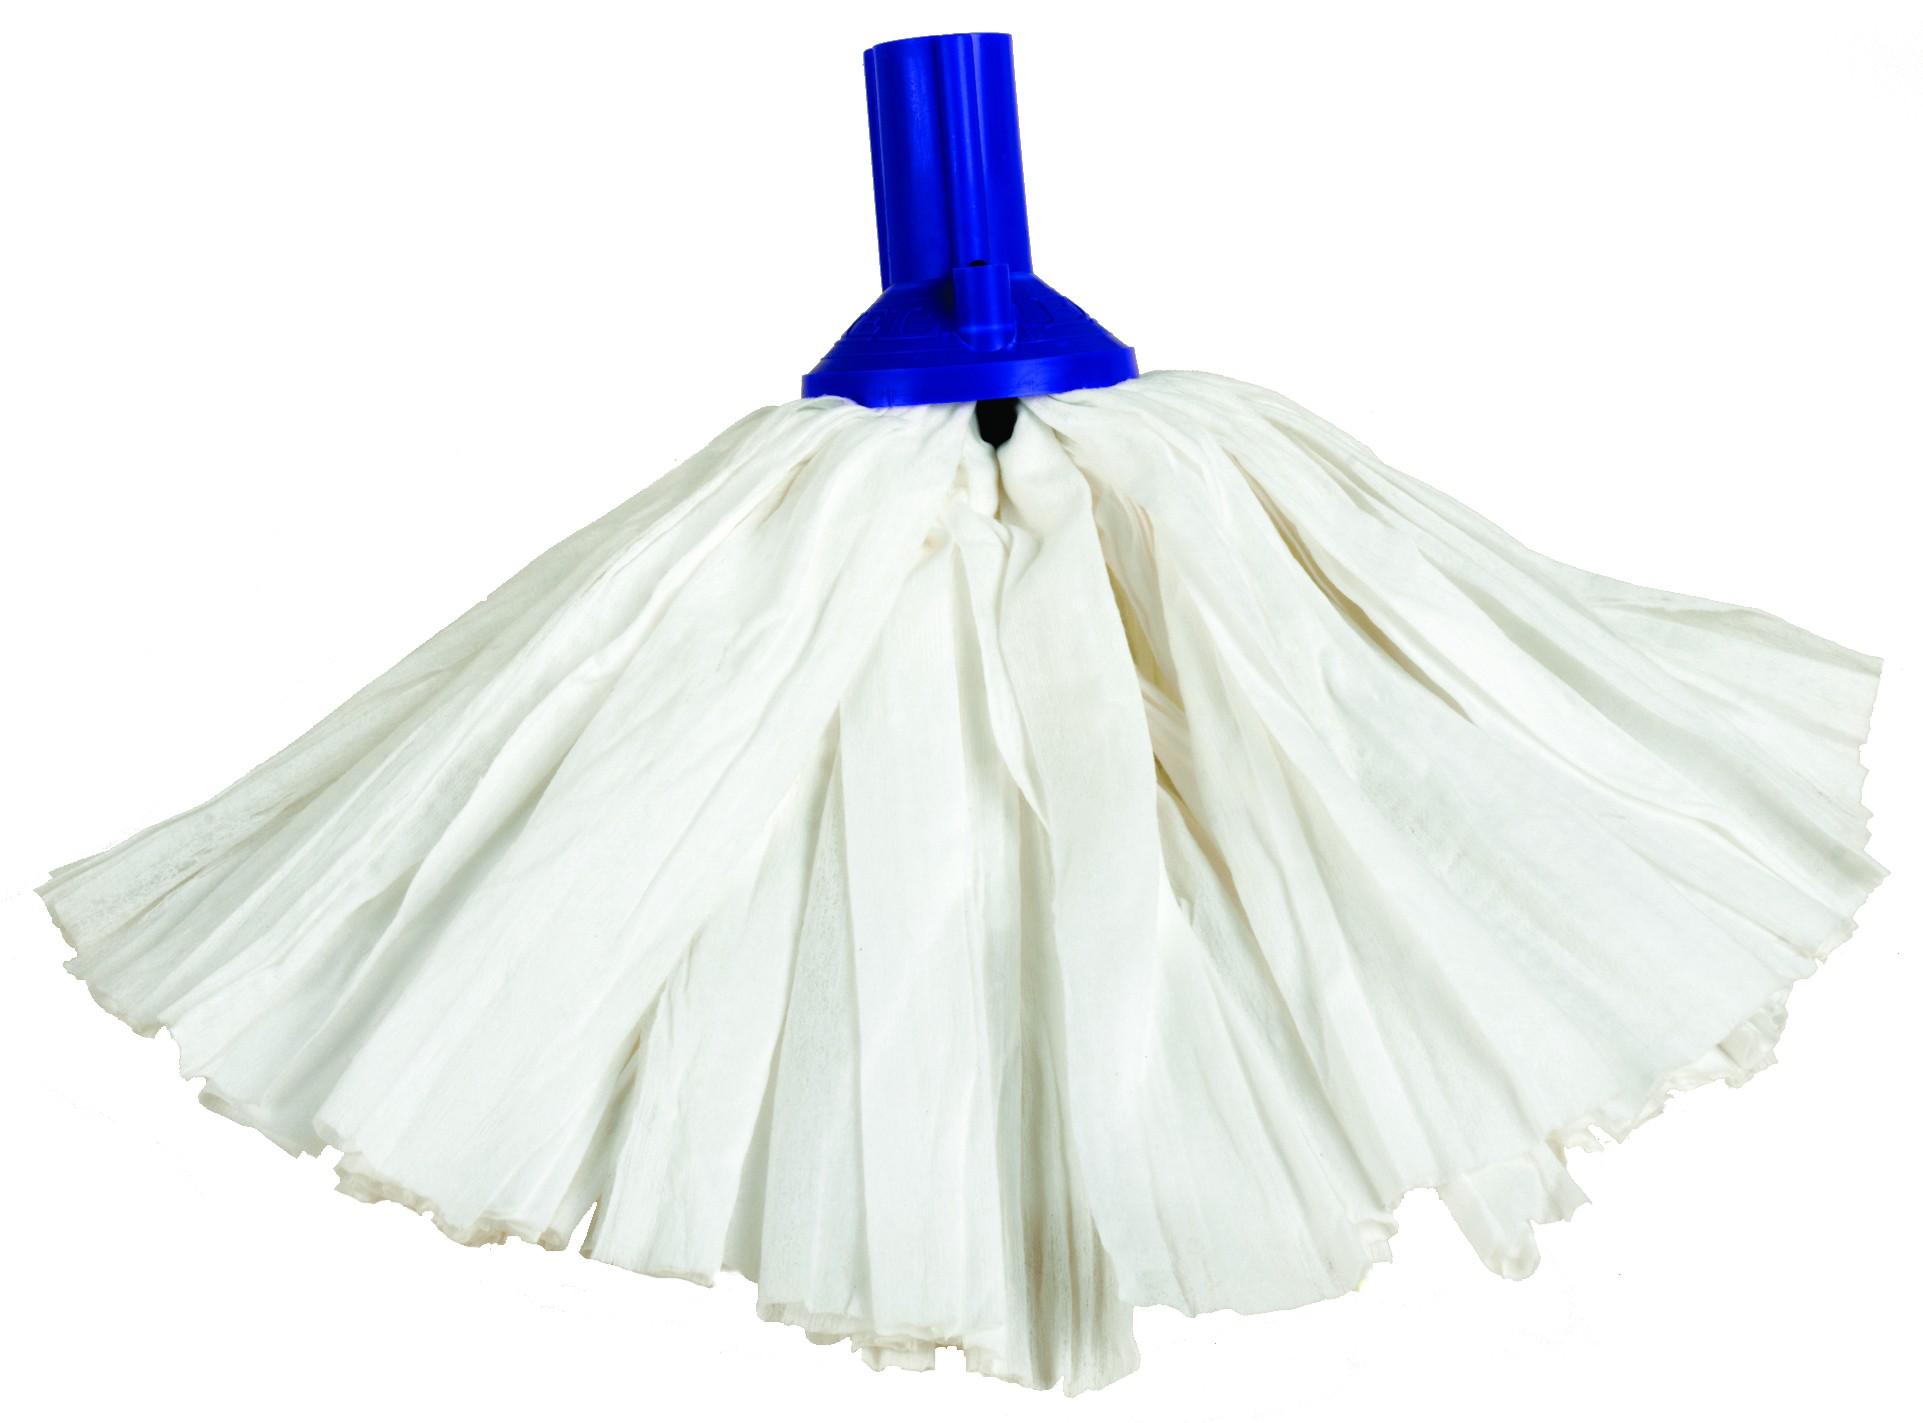 Strip mop